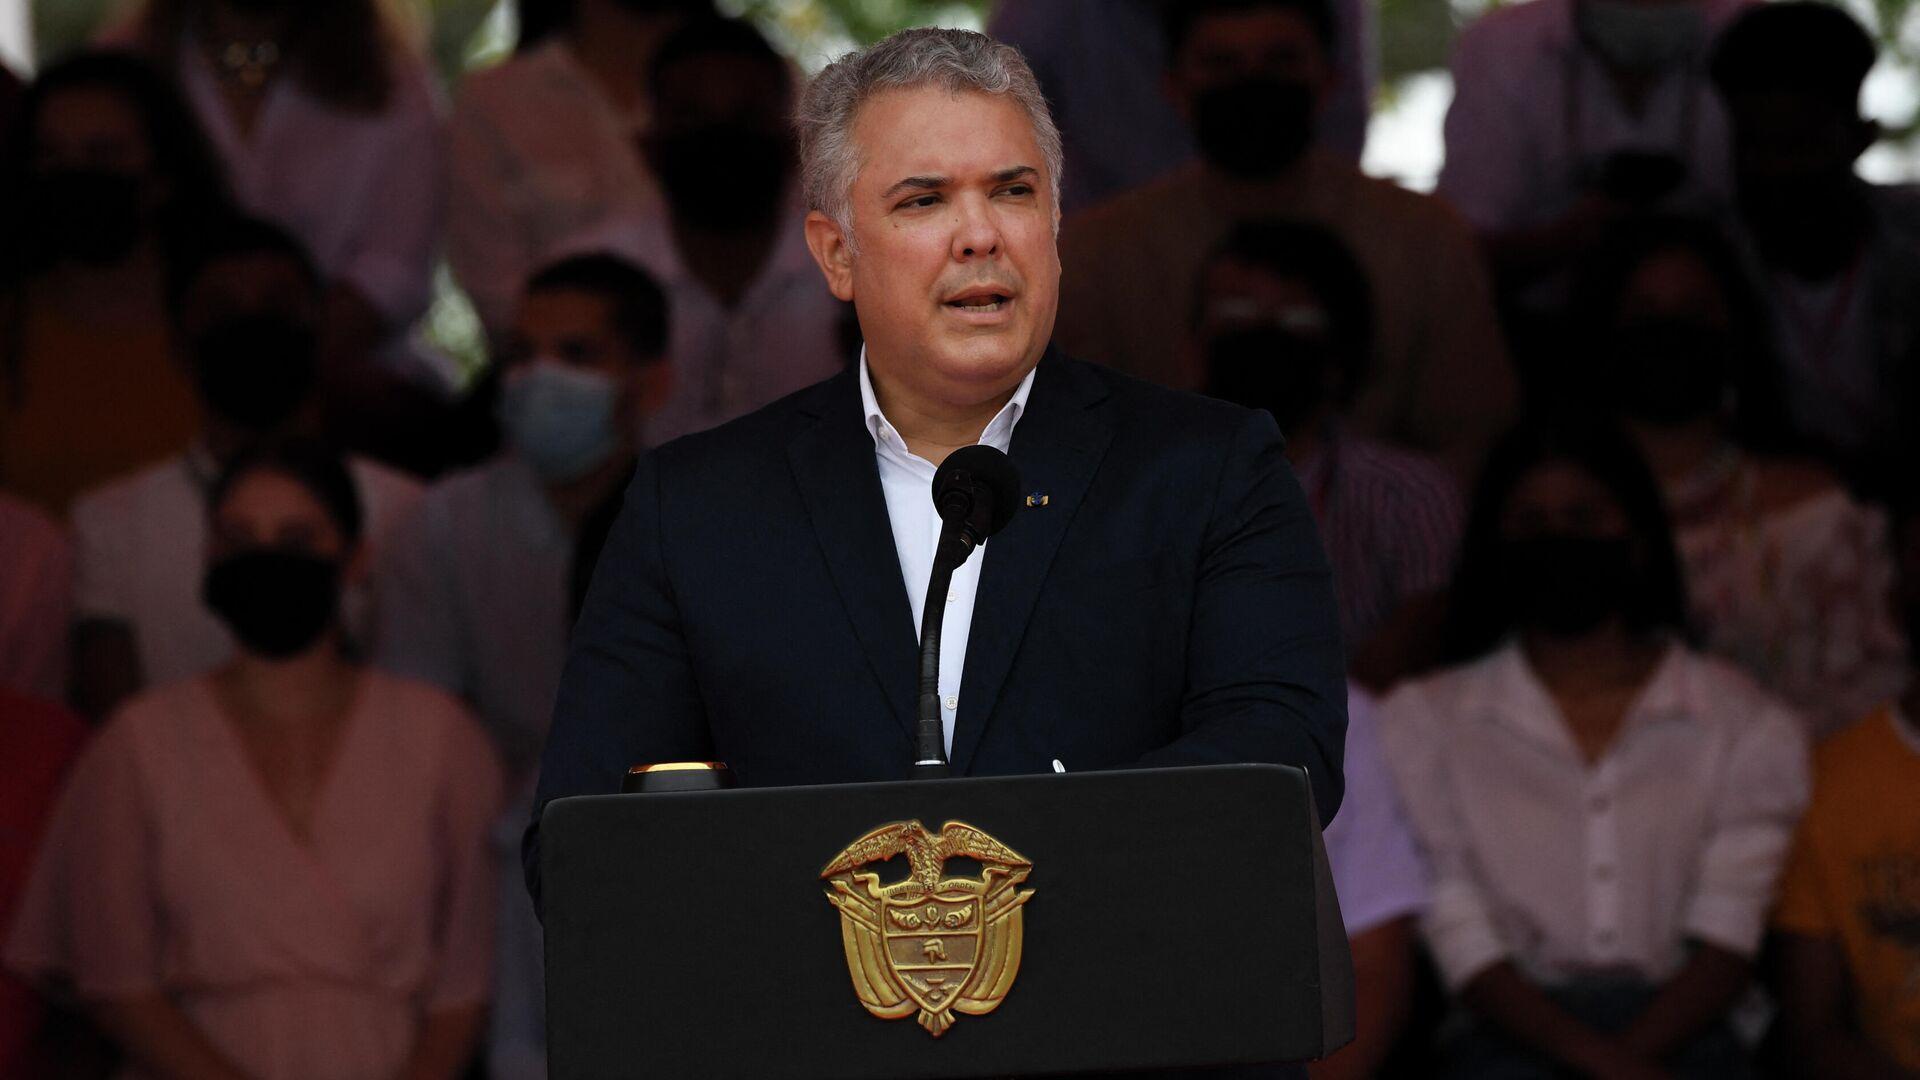 El presidente de Colombia, Iván Duque - Sputnik Mundo, 1920, 15.09.2021